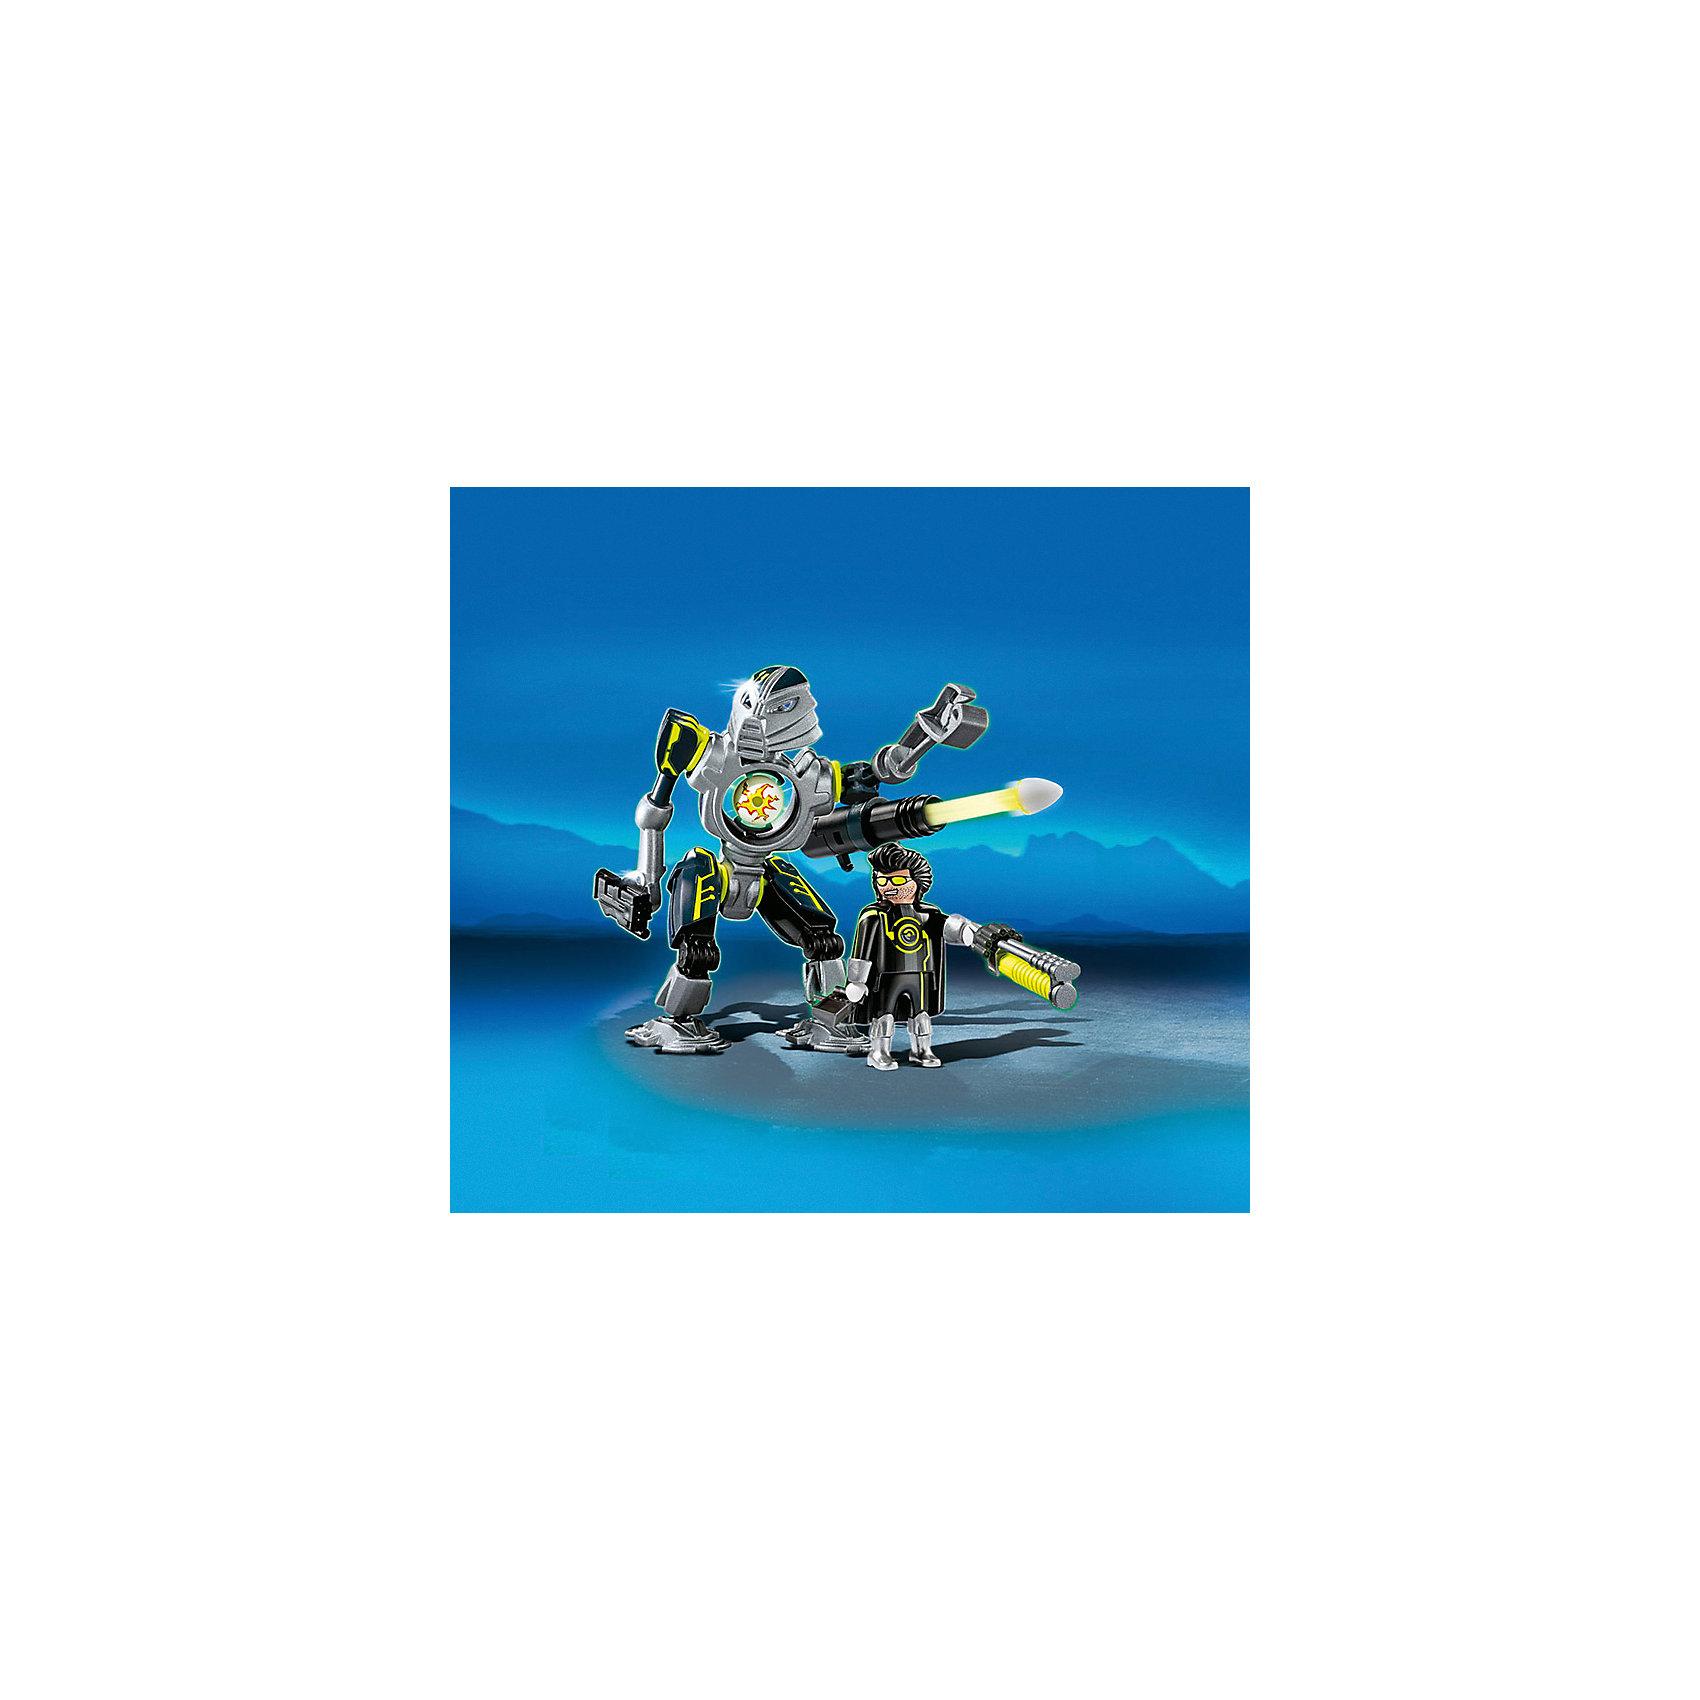 PLAYMOBIL® PLAYMOBIL 5289 Секретный агент: Мега робот с бластером playmobil® playmobil 5546 парк развлечений продавец шаров smileyworld